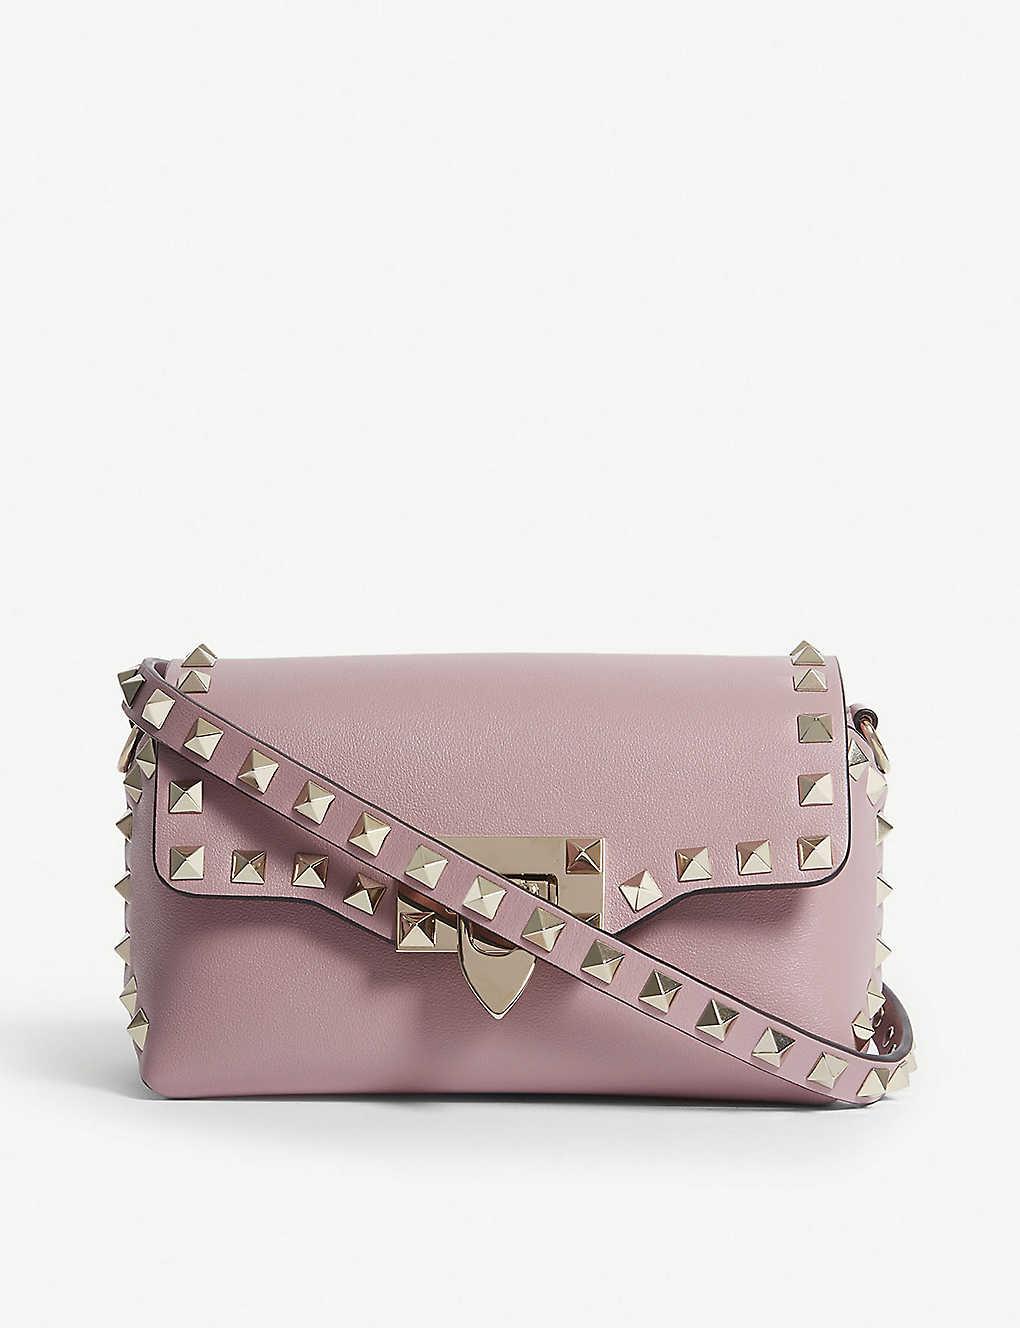 05056945d56f VALENTINO - Rockstud leather cross-body bag